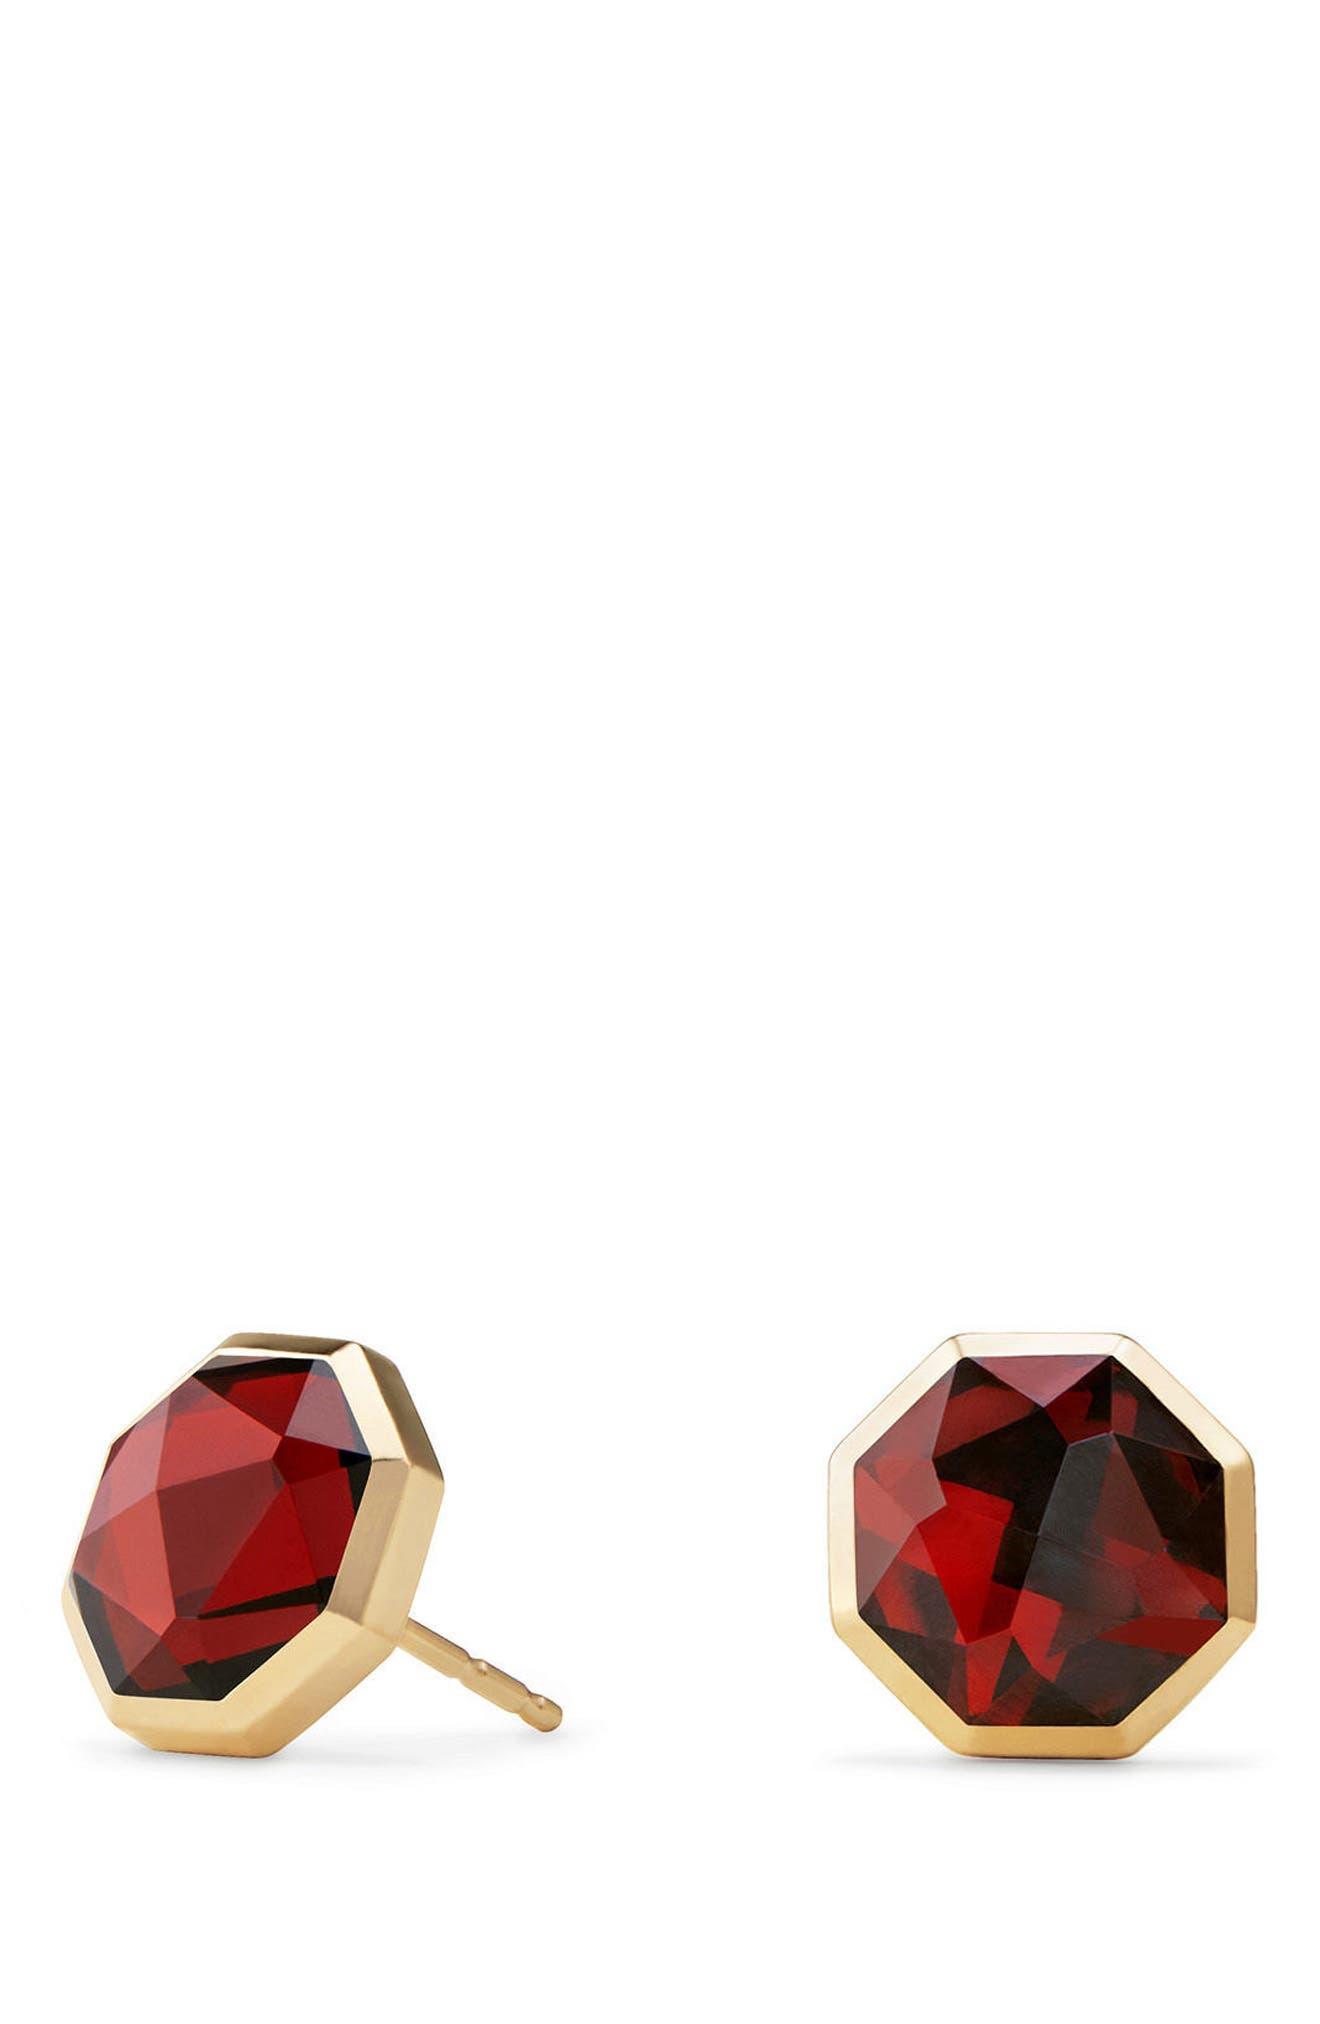 DAVID YURMAN Guilin Octagon Earrings in 18K Gold